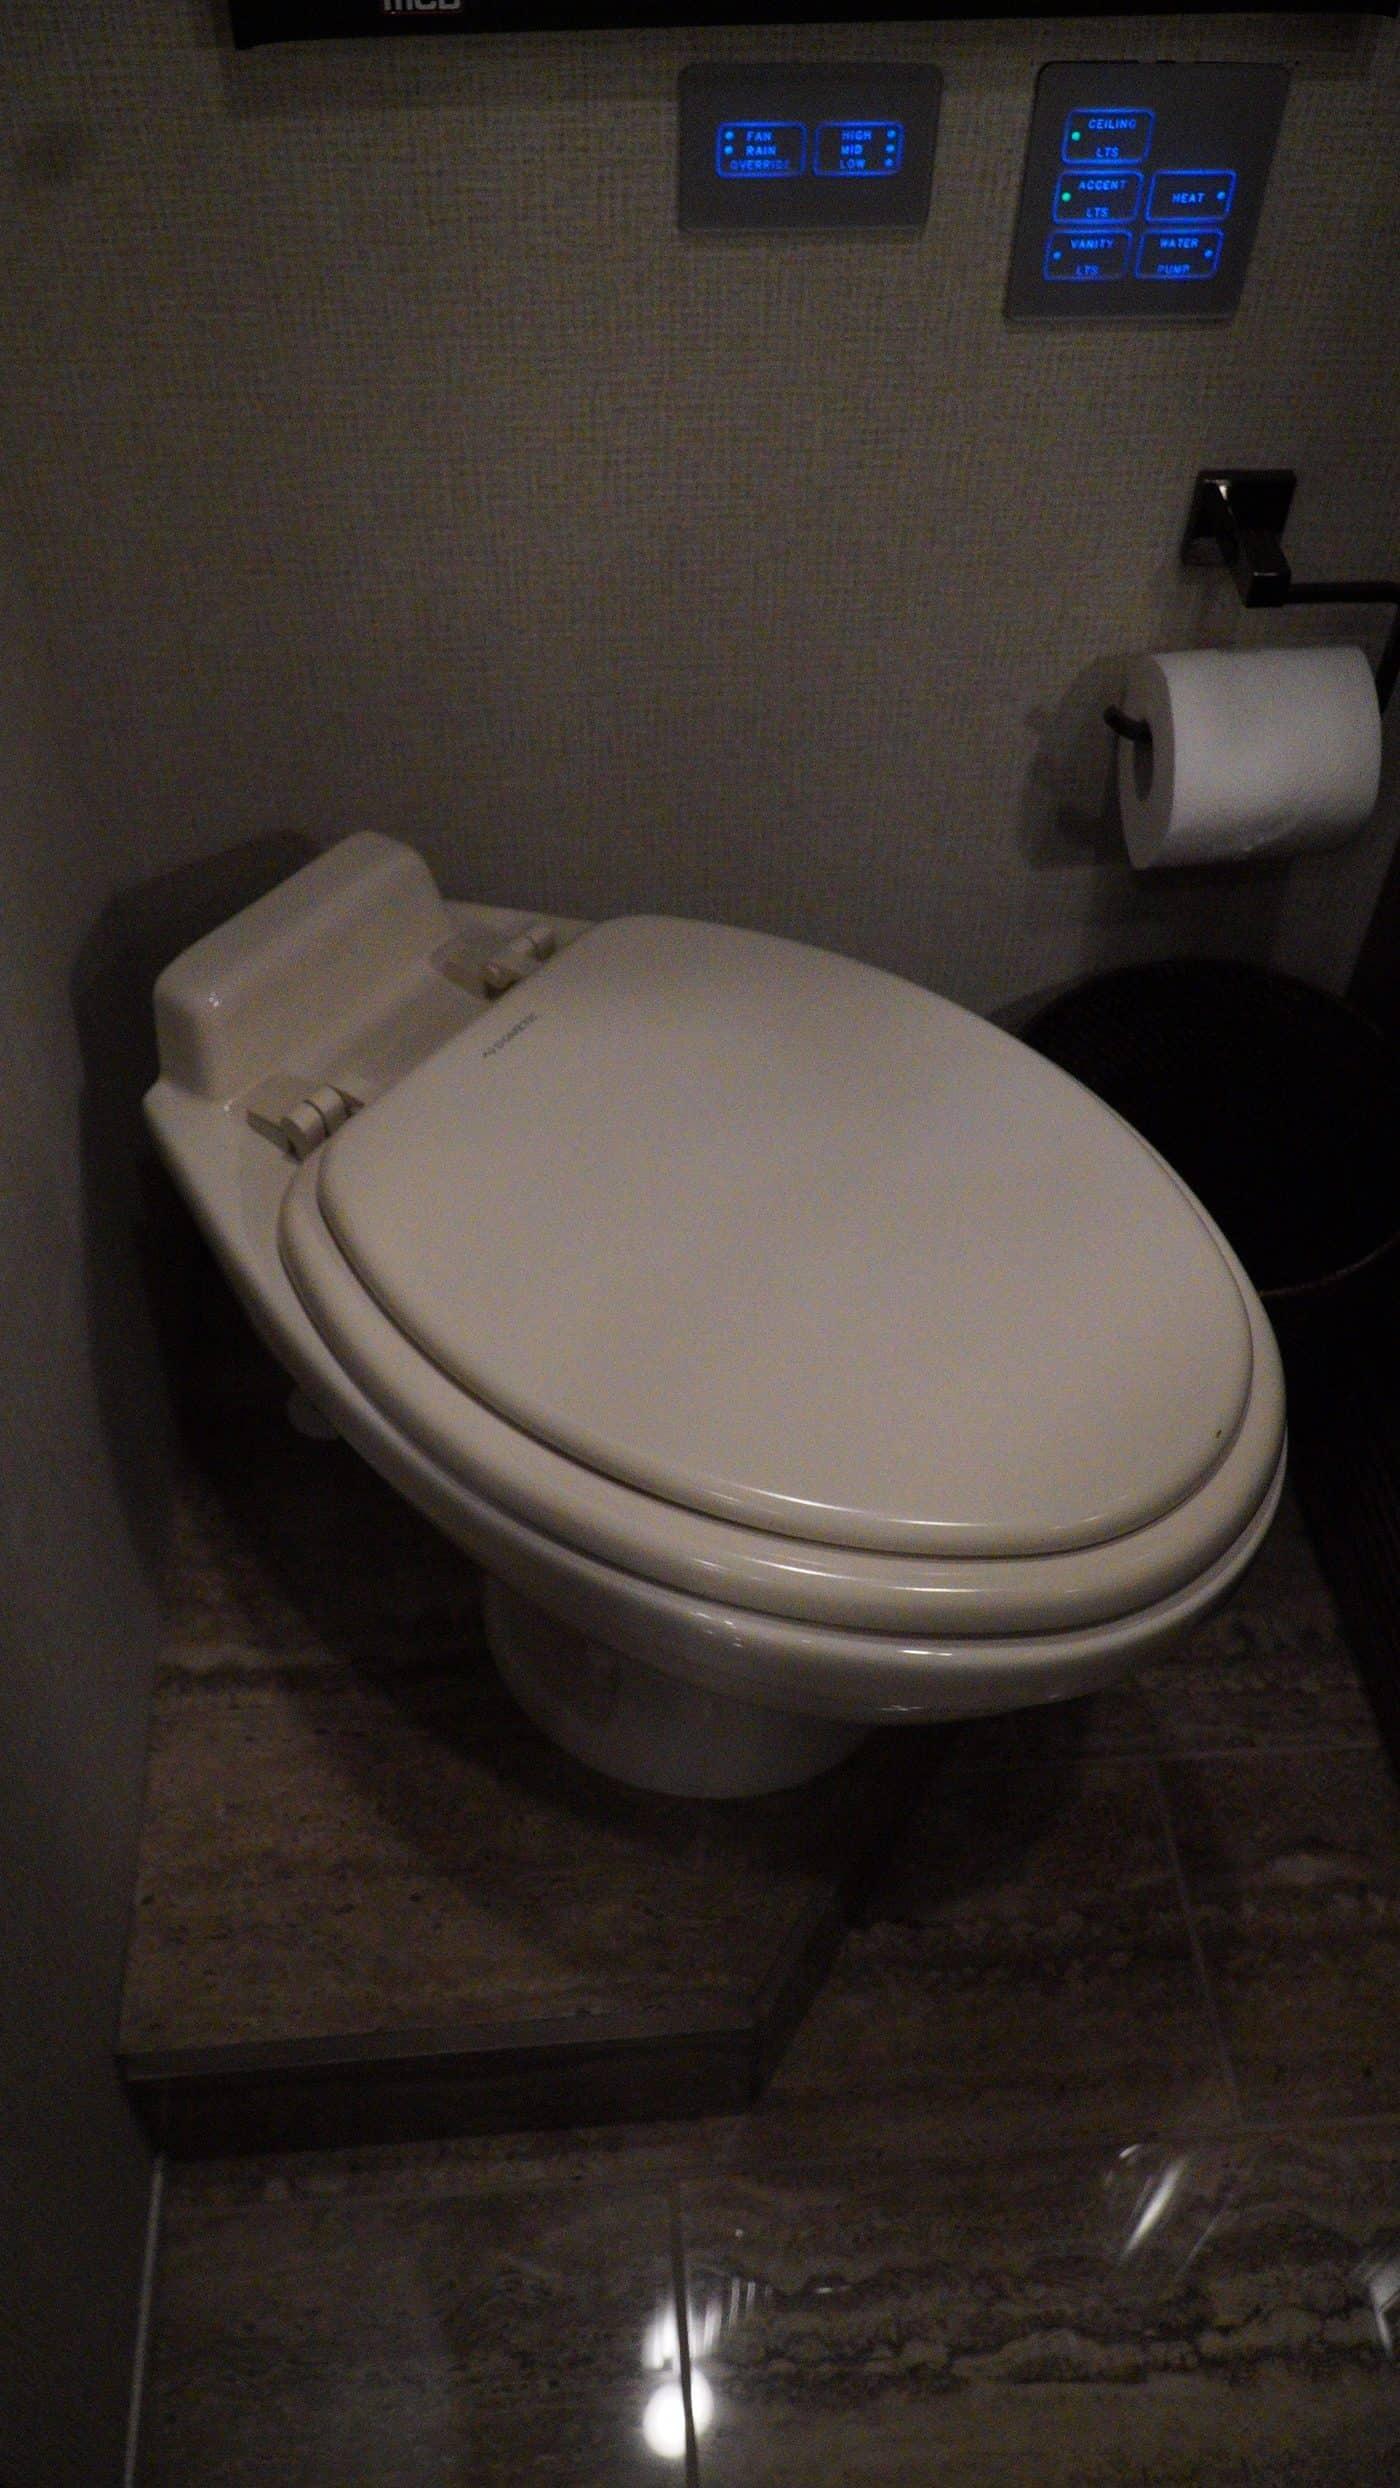 RV Toilet Repair Near Me